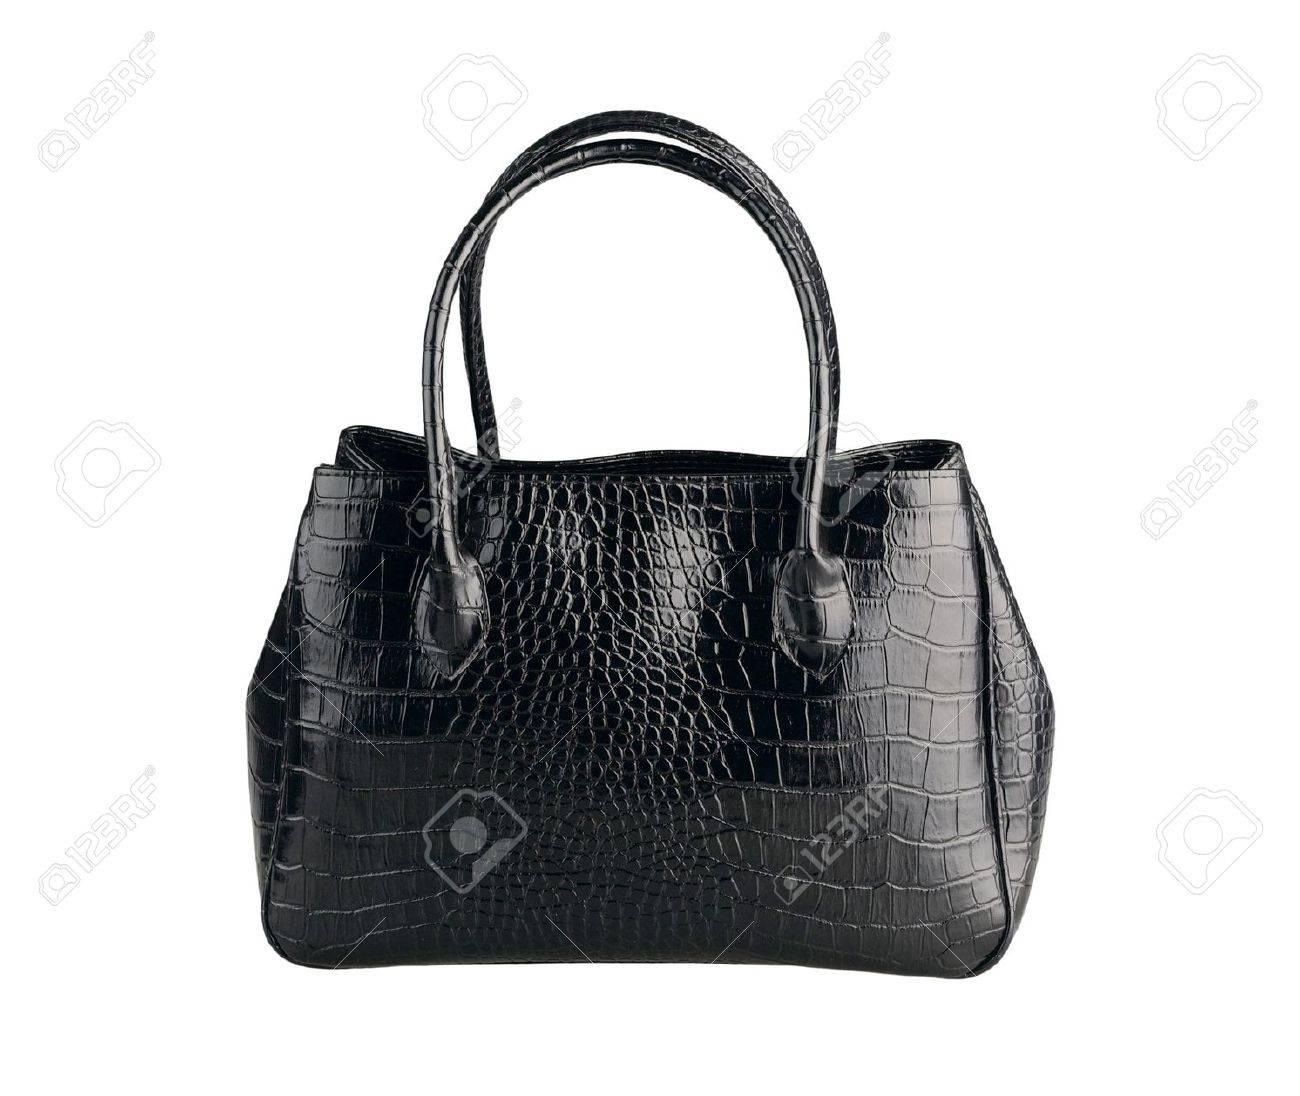 fffe7de6 Beautiful black leather handbag made from crocodile leather isolates on white  Stock Photo - 15732930